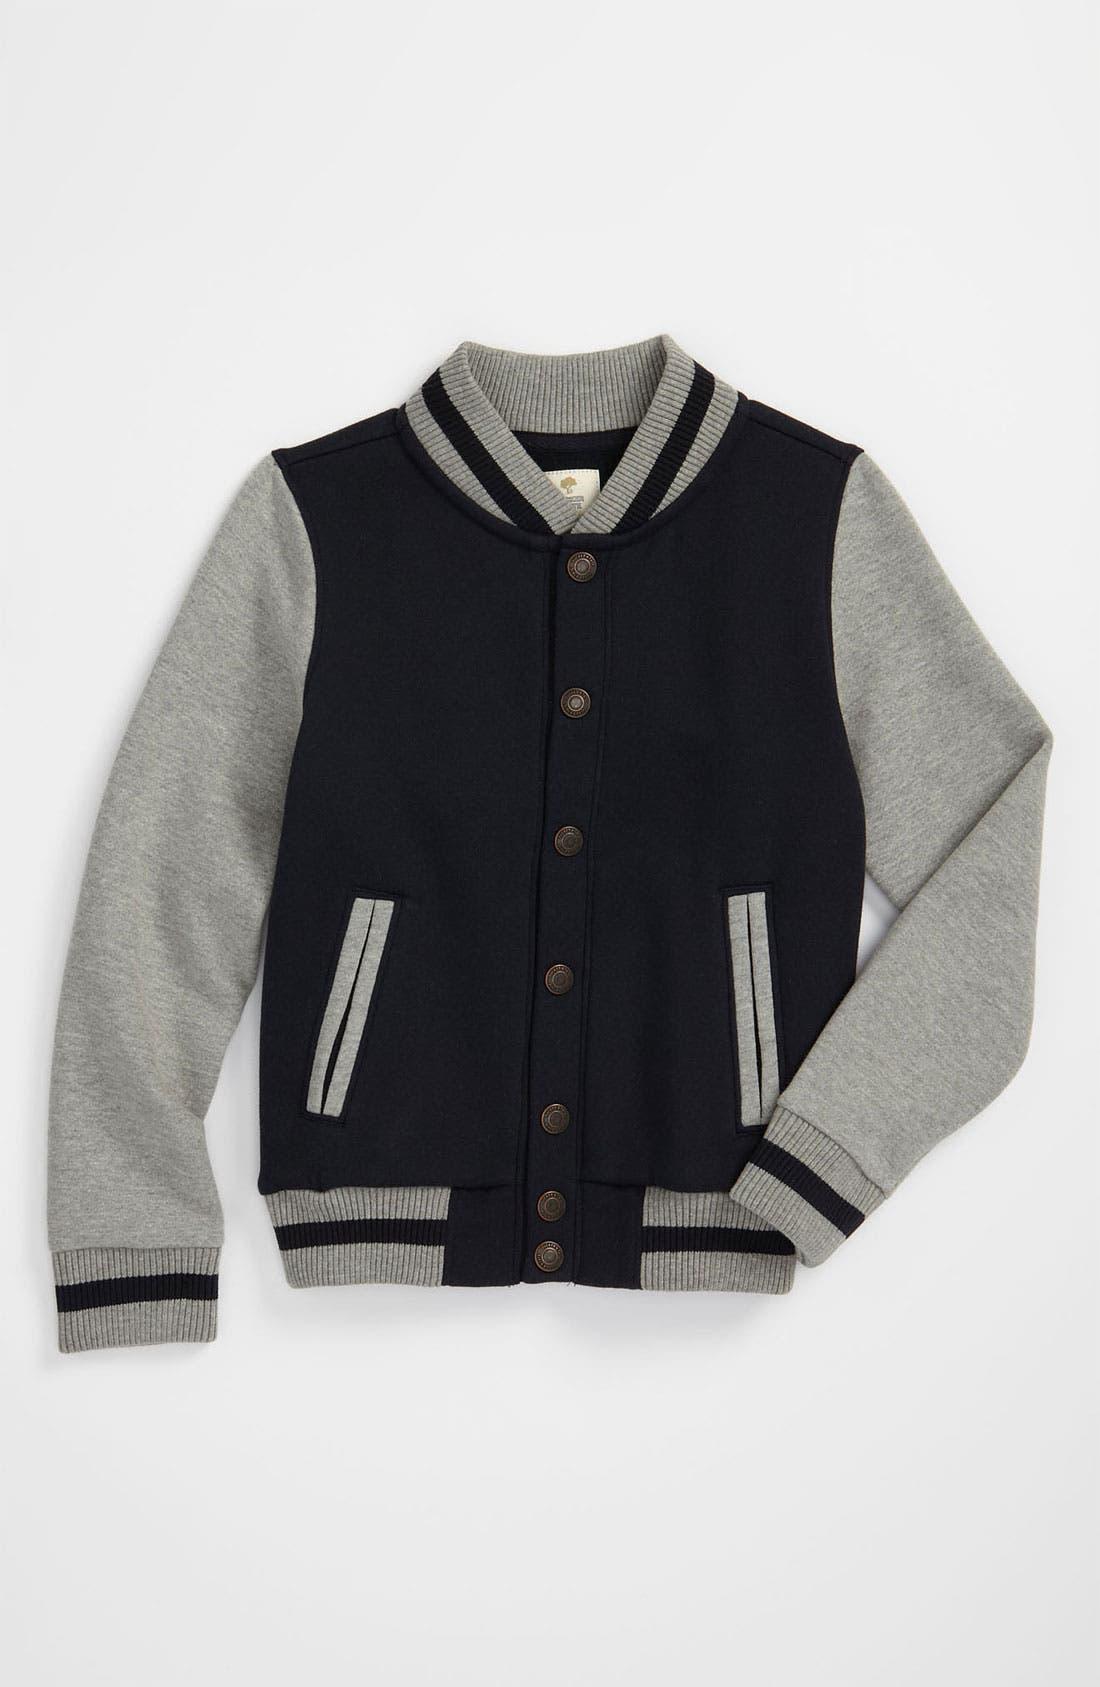 Alternate Image 1 Selected - Tucker + Tate 'Emmit' Varsity Jacket (Big Boys)